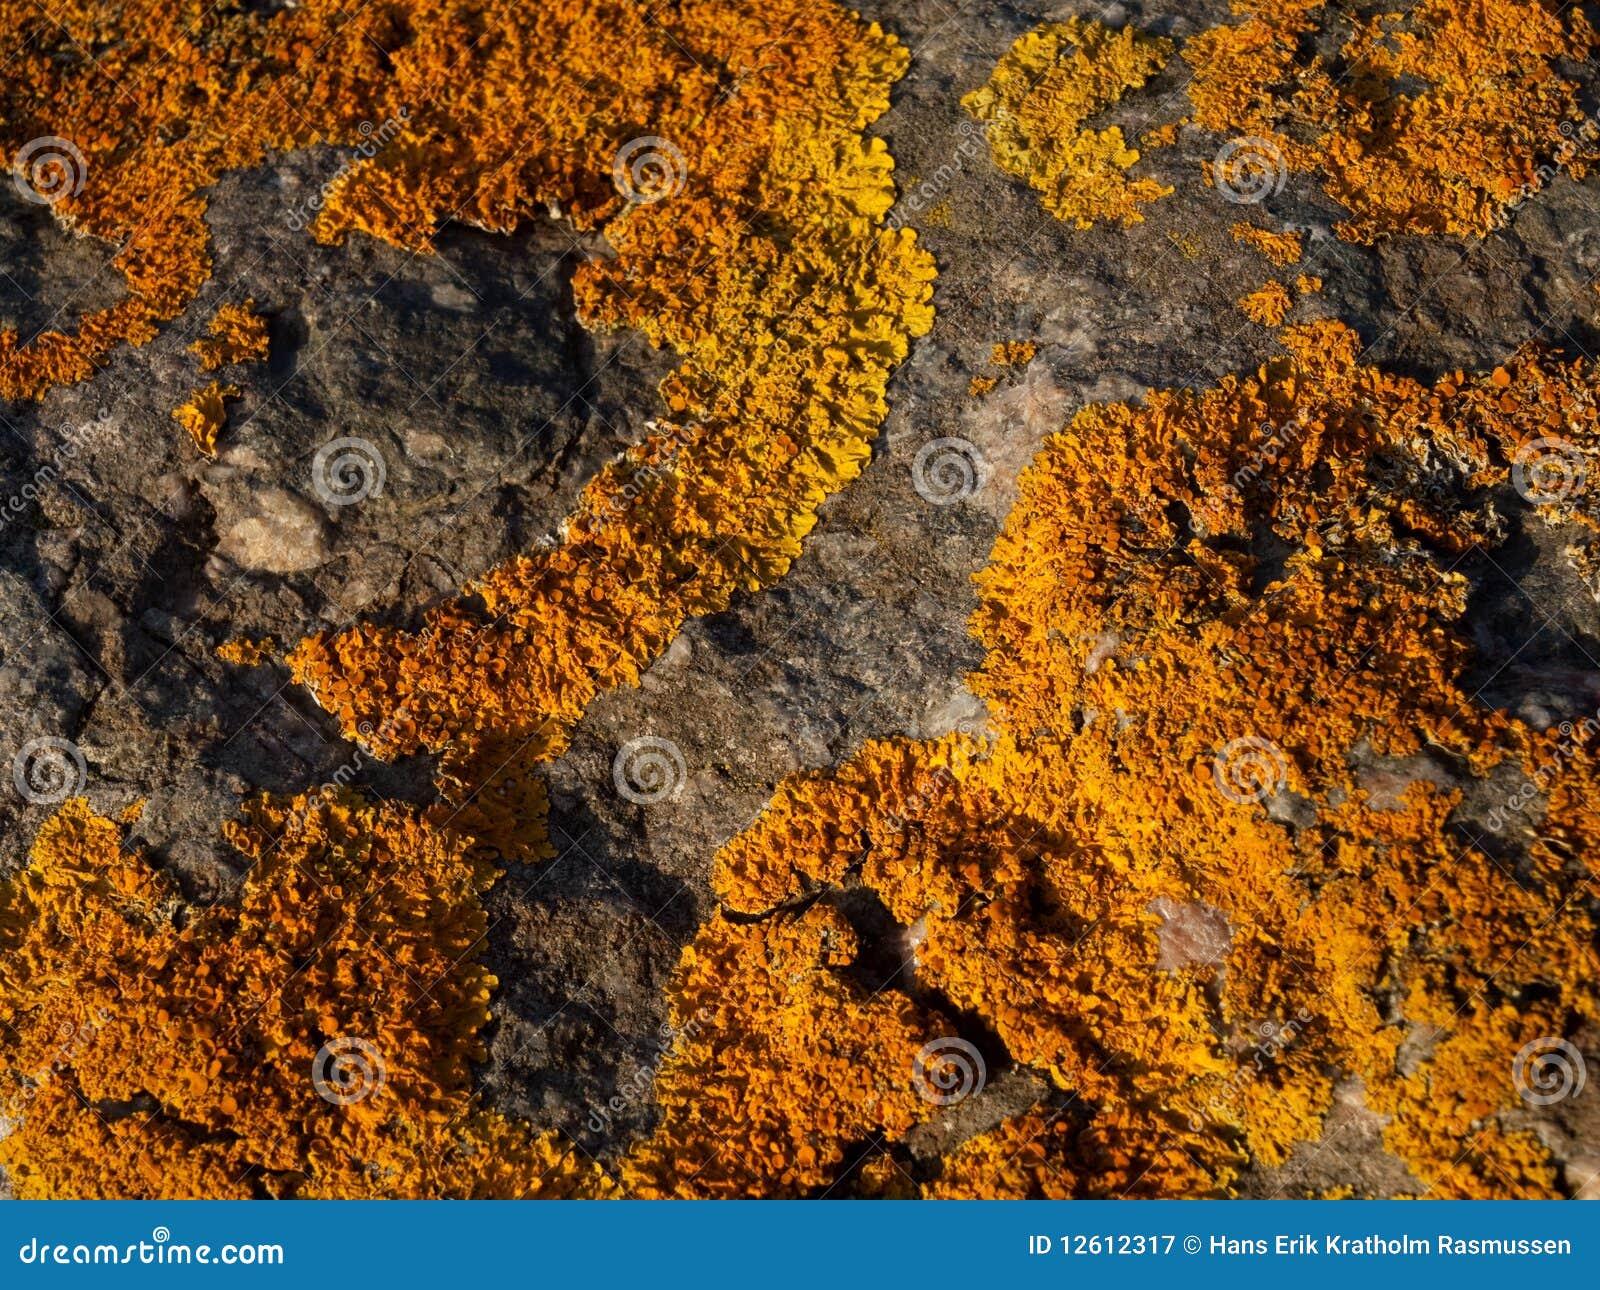 Mossgrown Stone